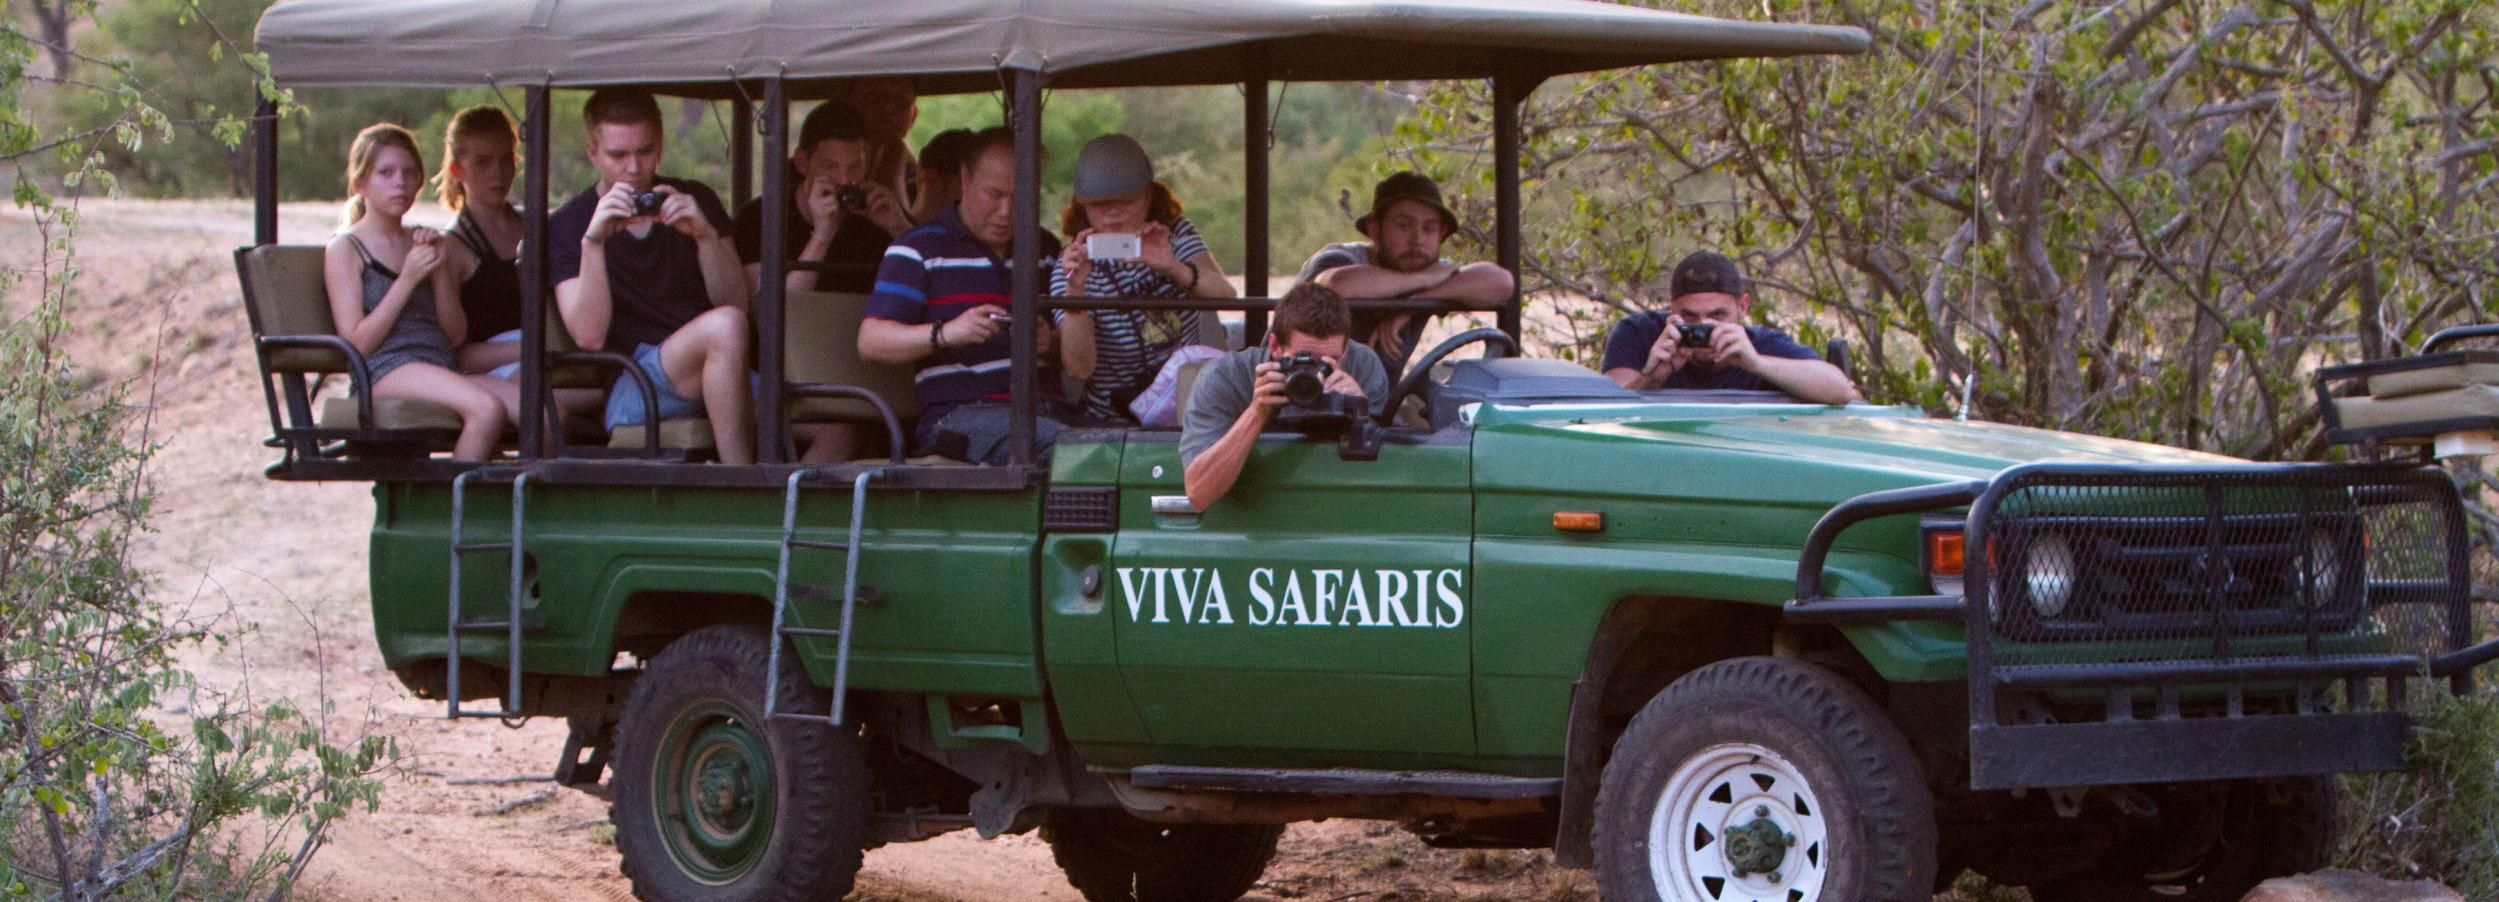 Ab Johannesburg: 3-tägige Safari im Kruger-Nationalpark